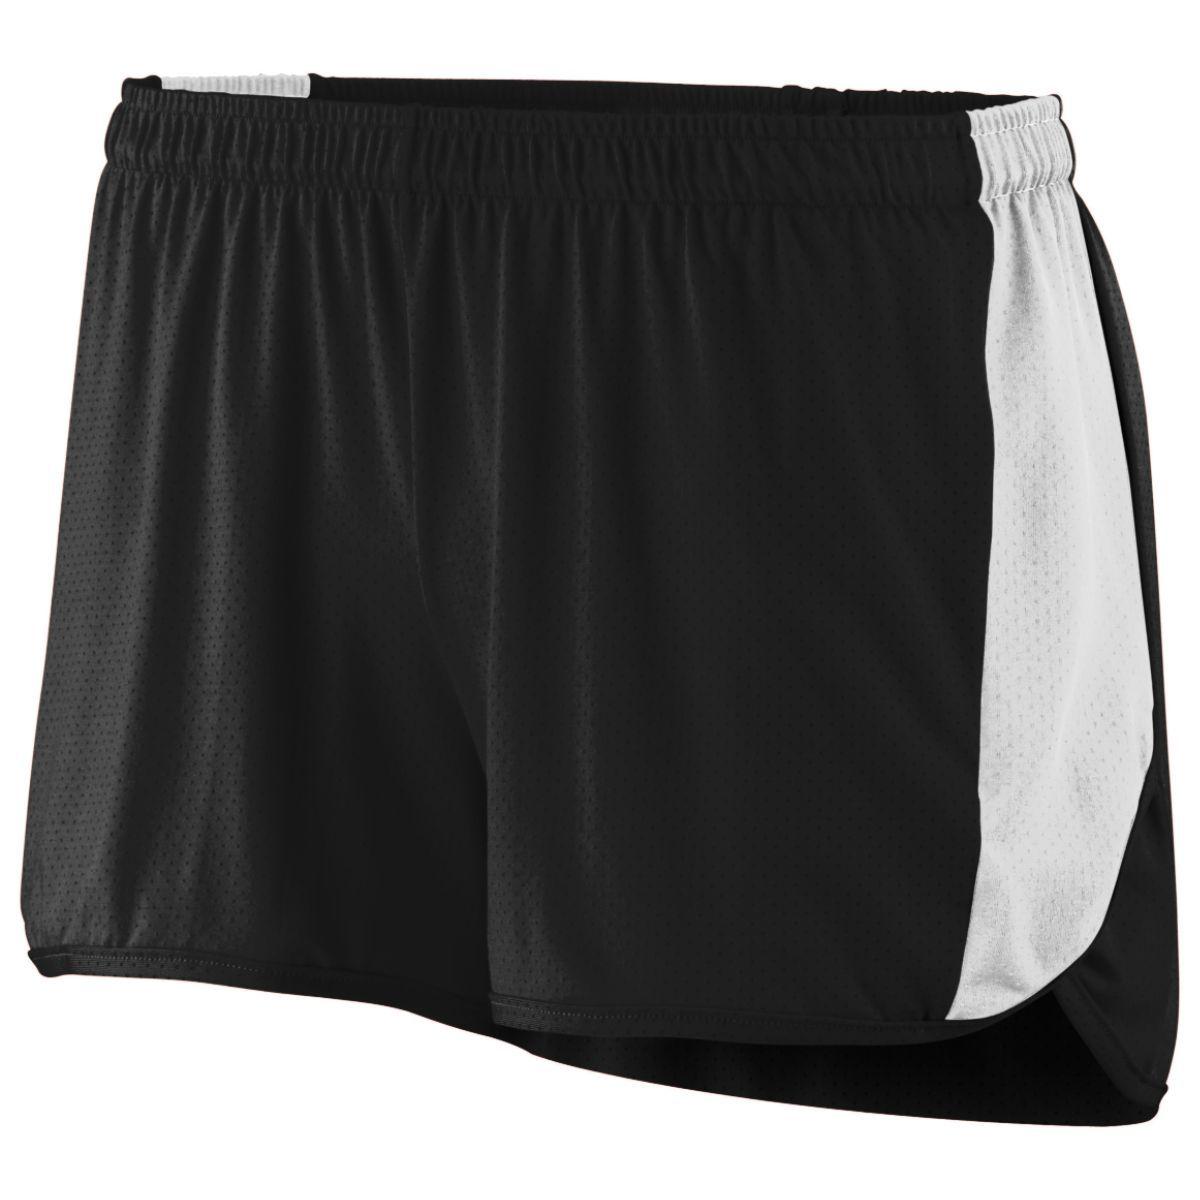 Ladies Sprint Shorts - BLACK/WHITE